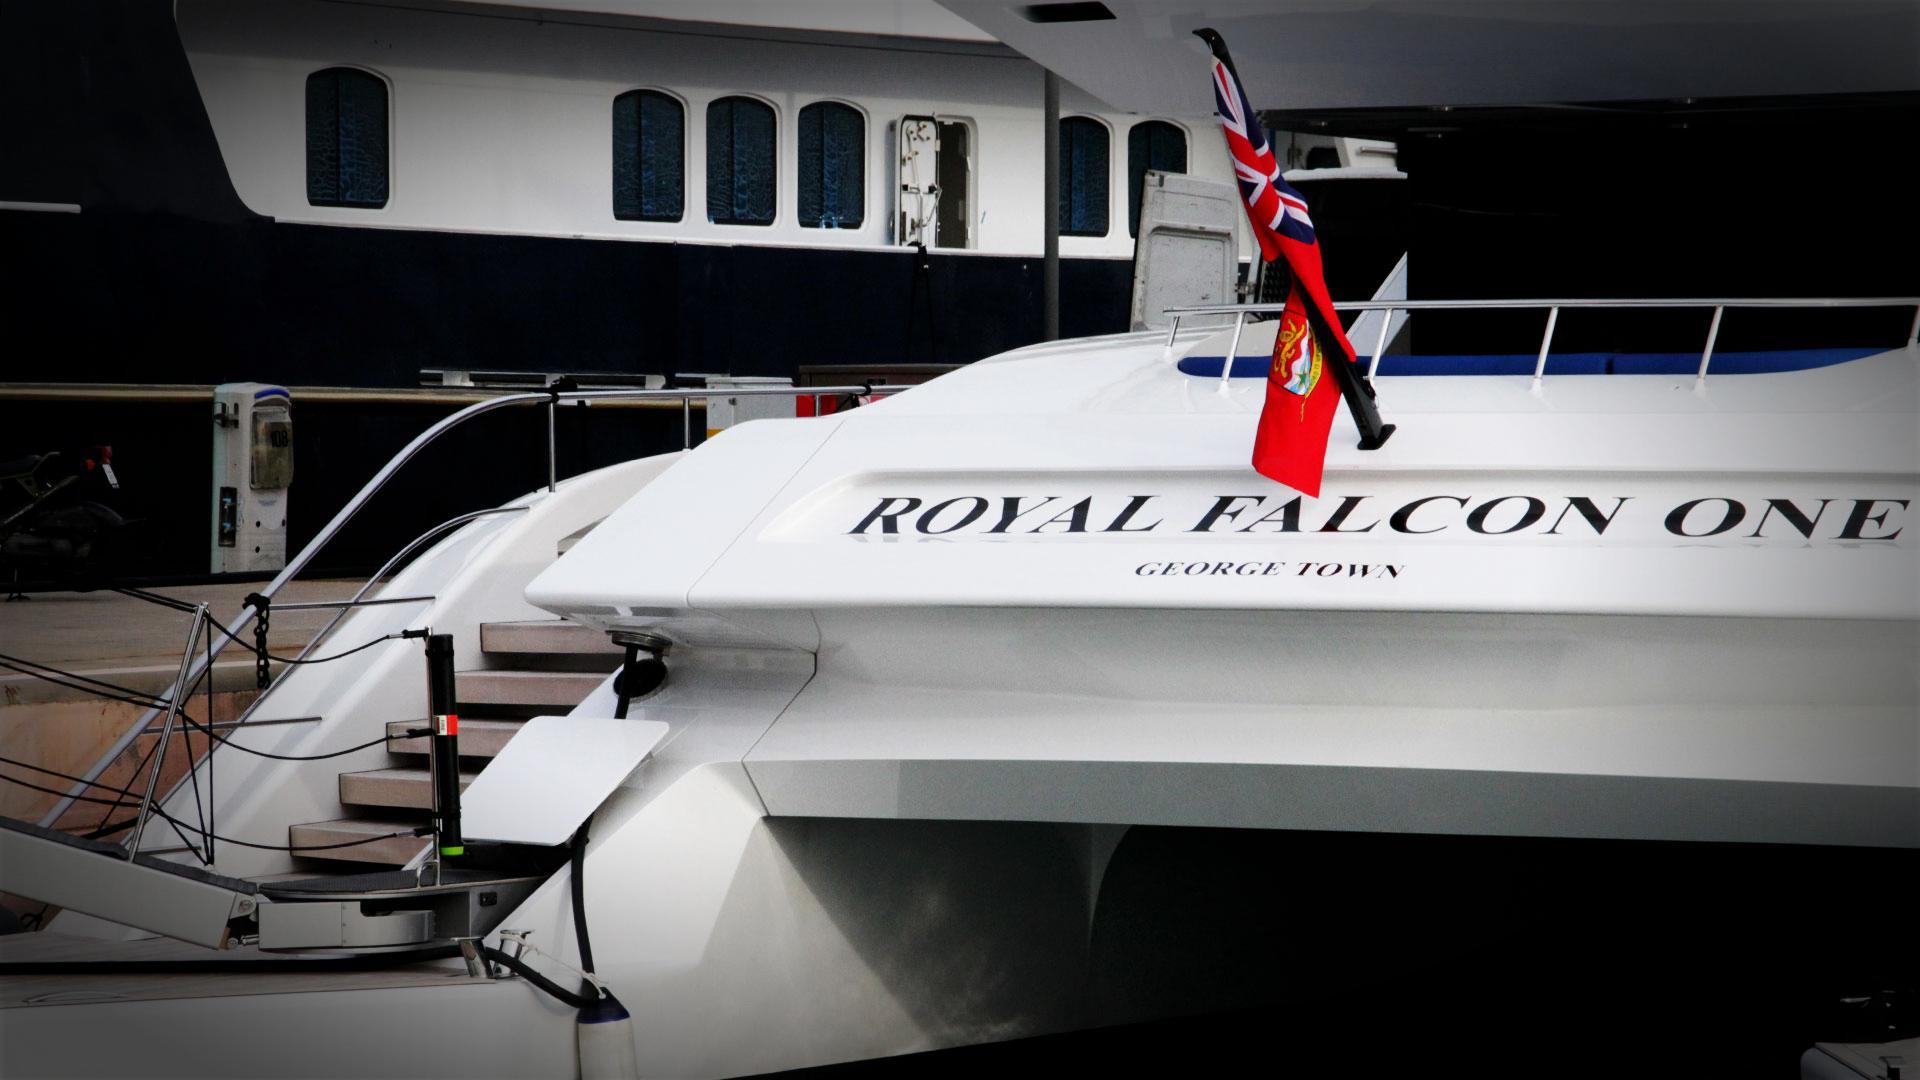 royal-falcon-fleet-royal-falcon-one (20)